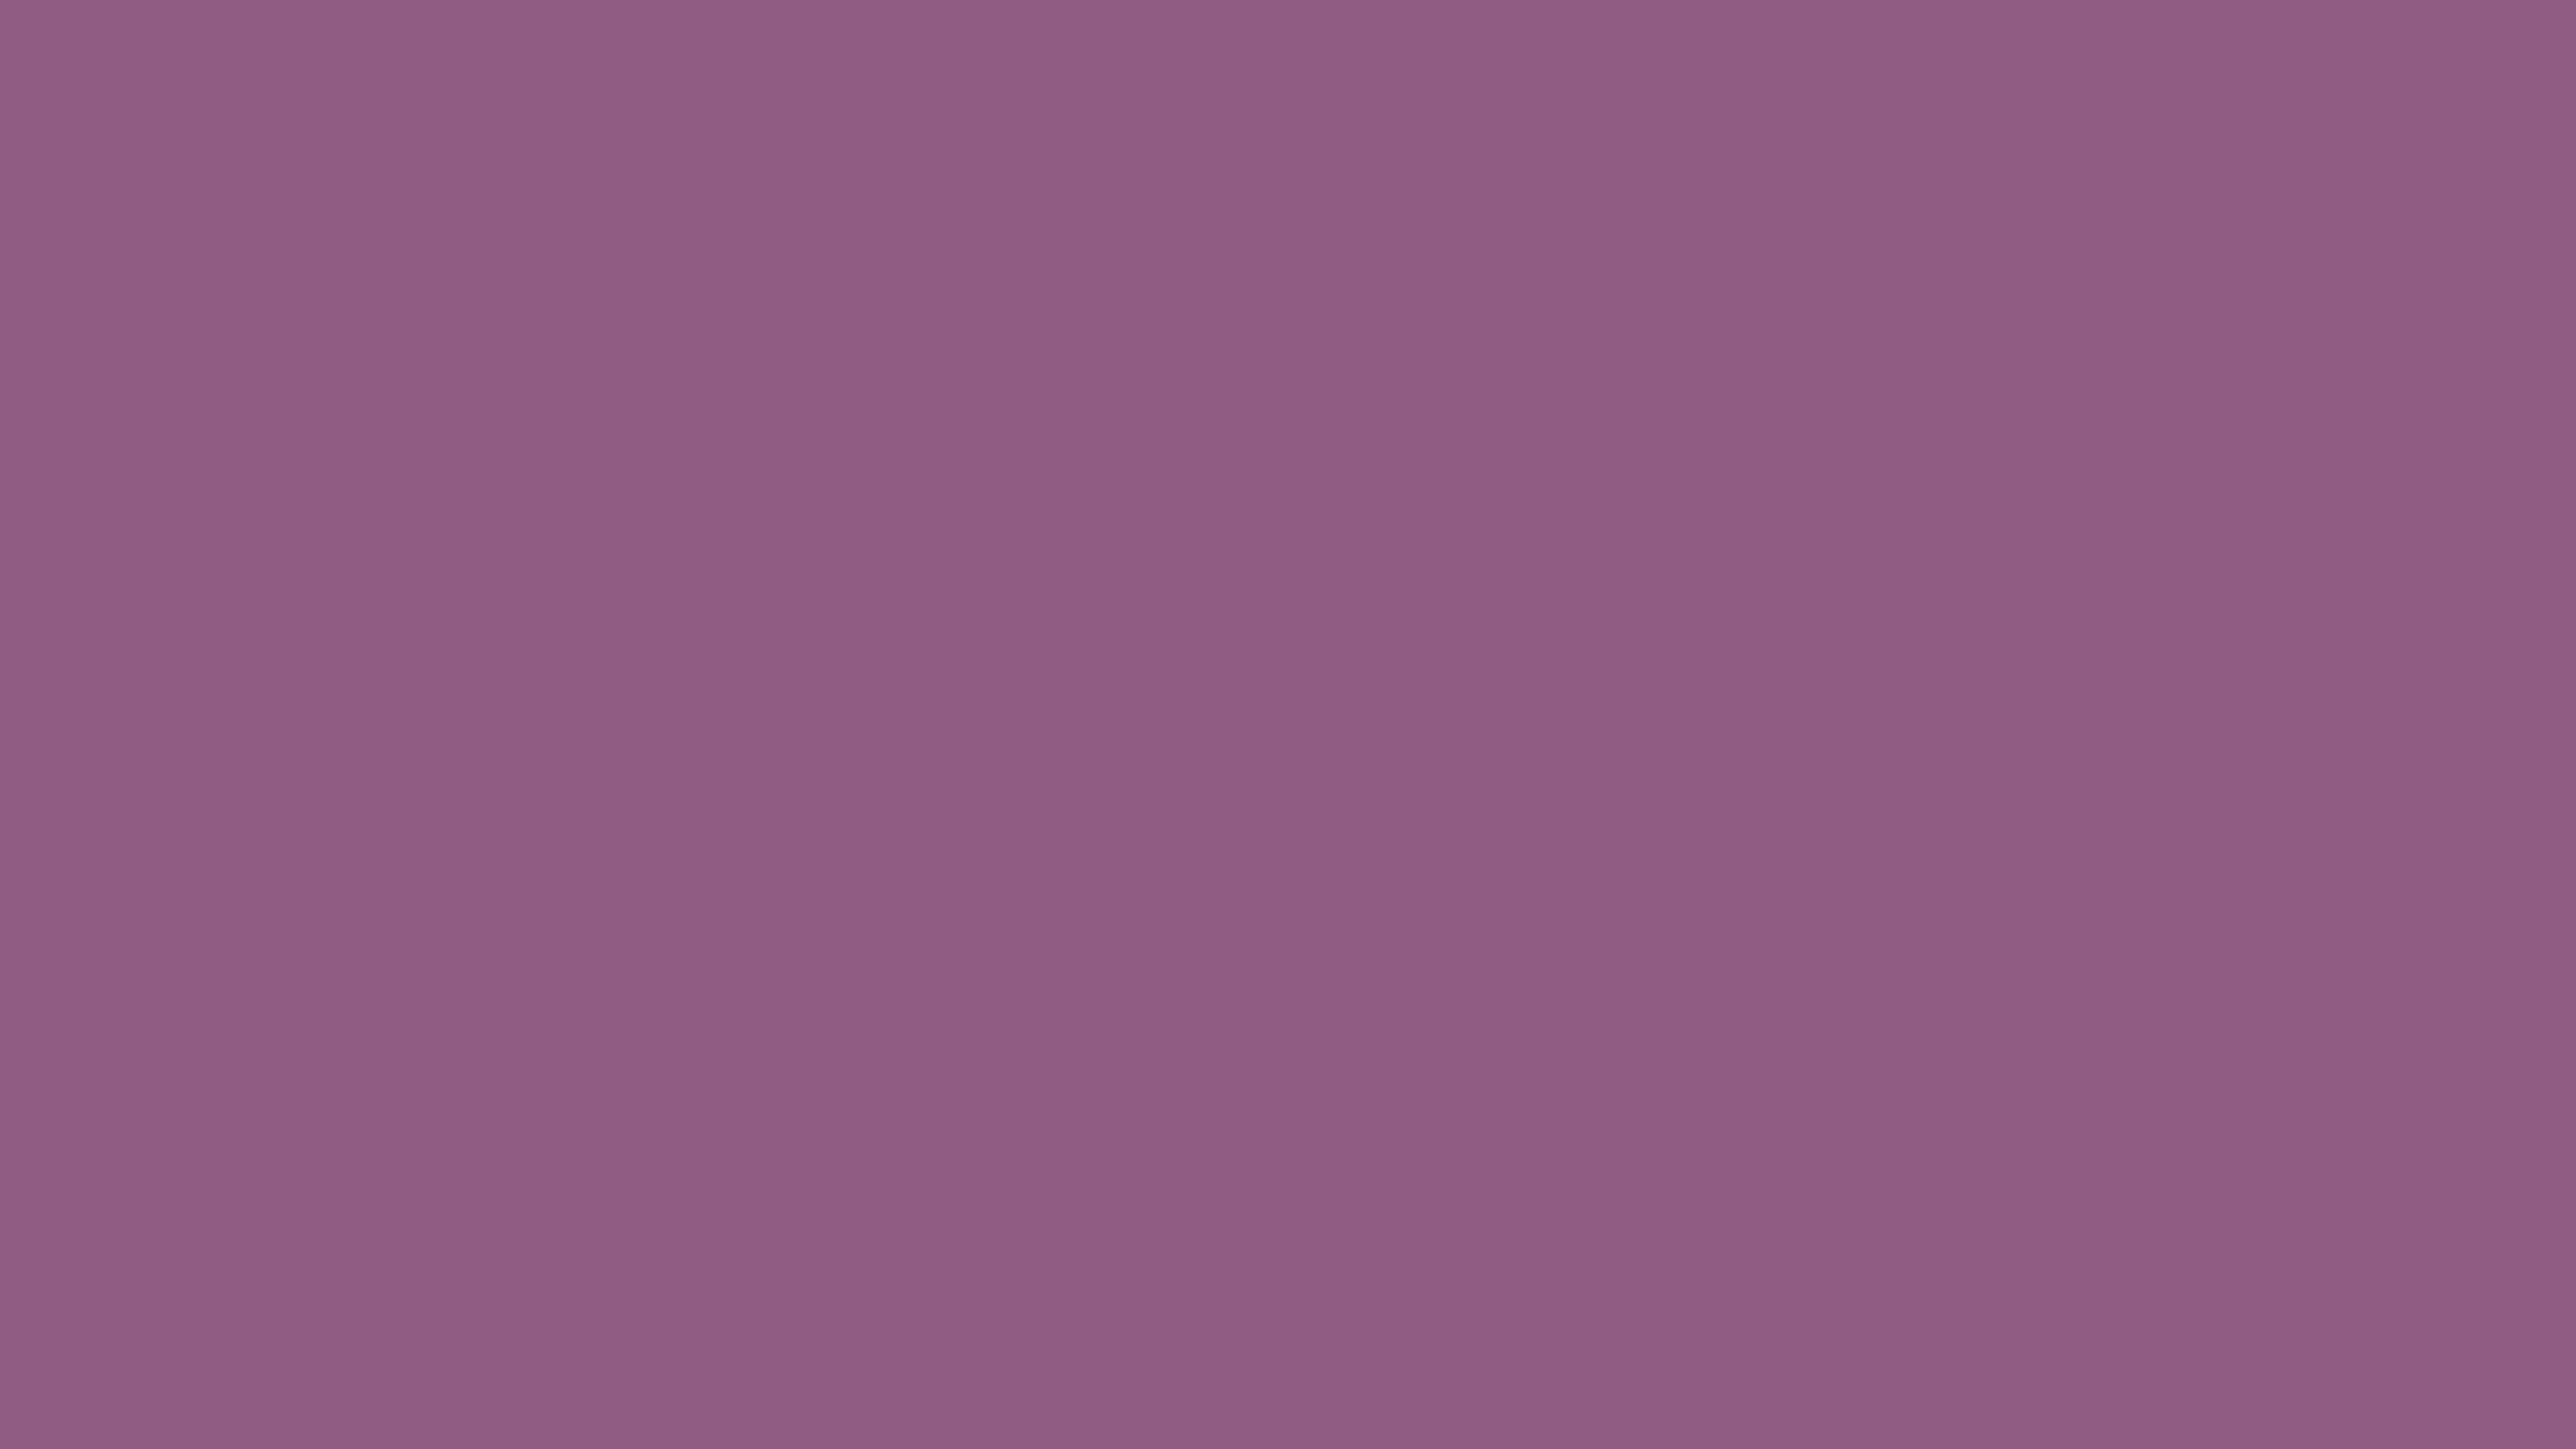 4096x2304 Antique Fuchsia Solid Color Background